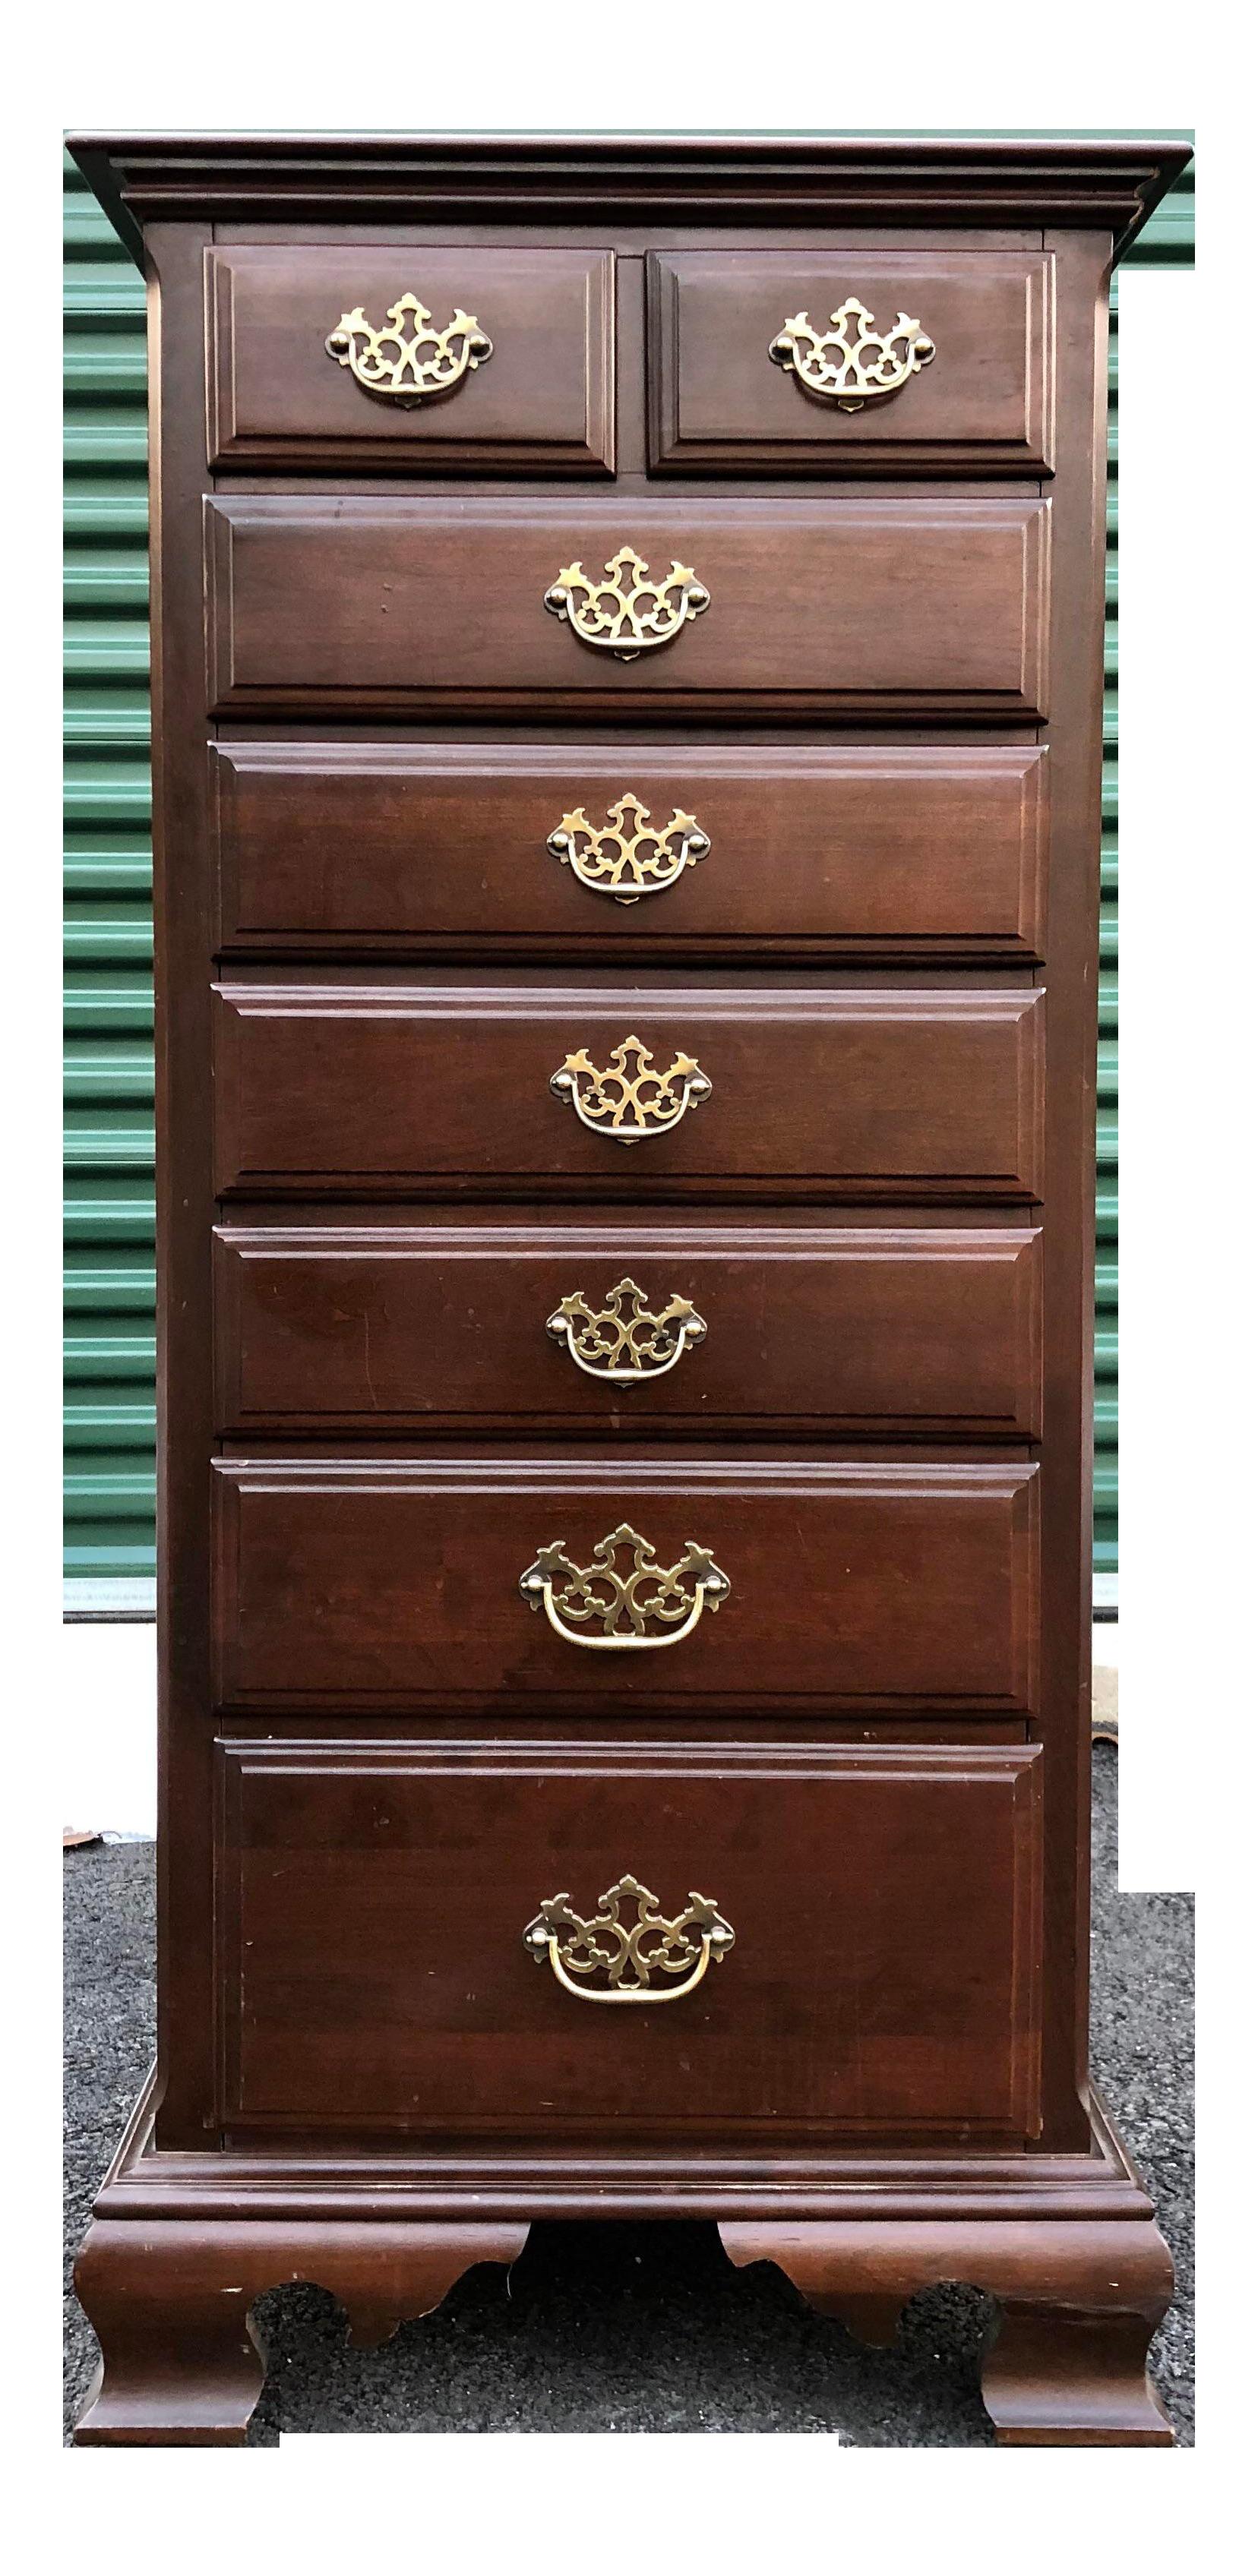 Jamestown American Tall Cherry Lingerie Dresser Chest